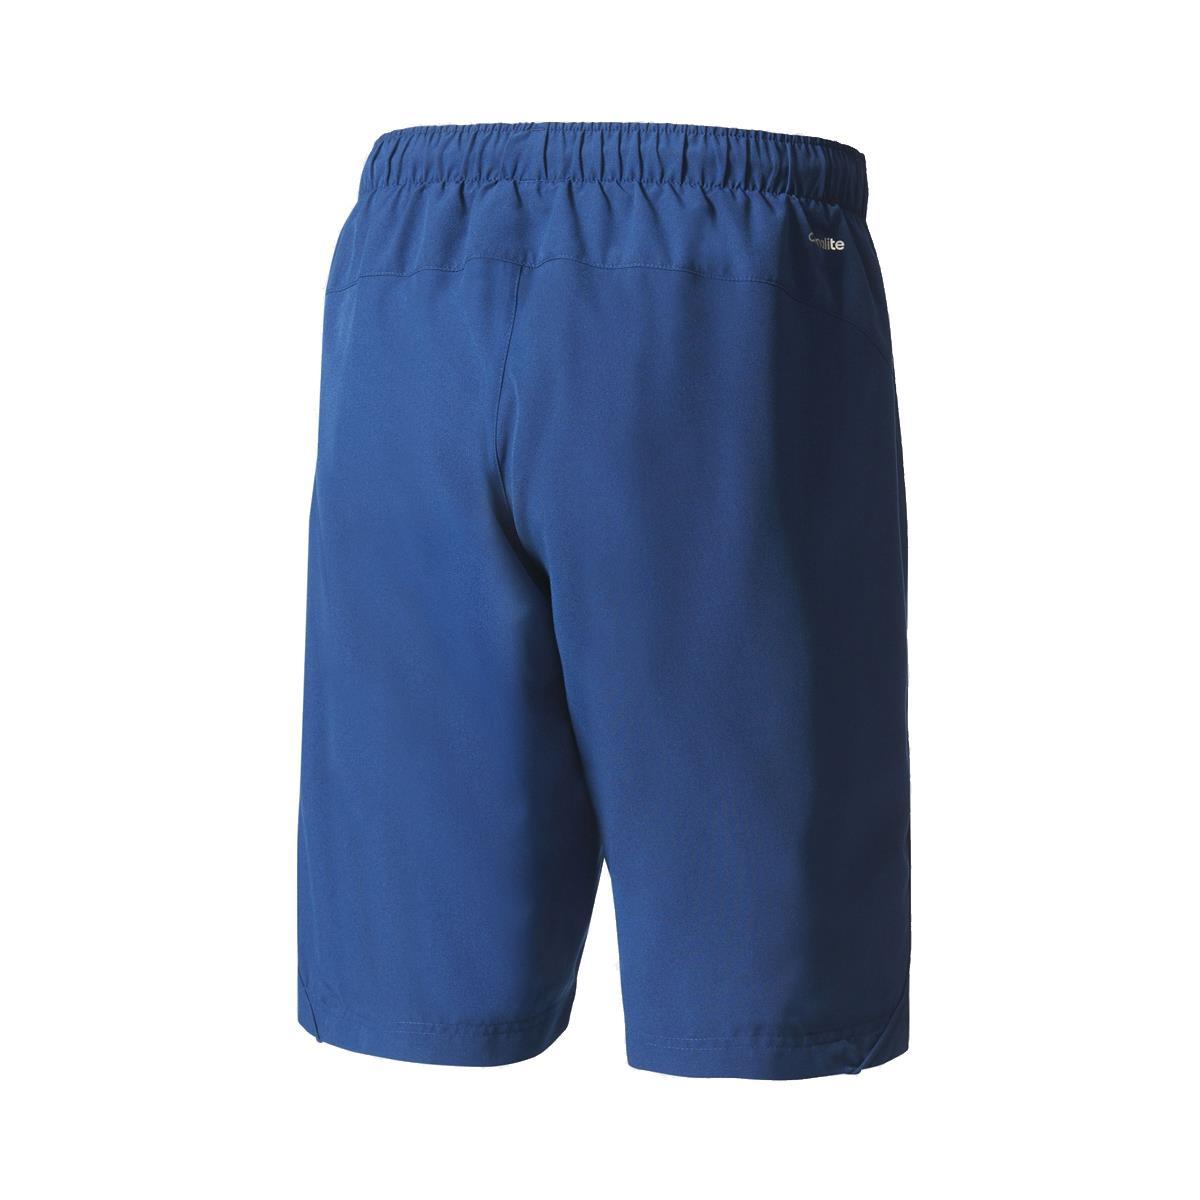 8036a742afb Bermuda Longa Adidas Chelsea Essentials Masculina